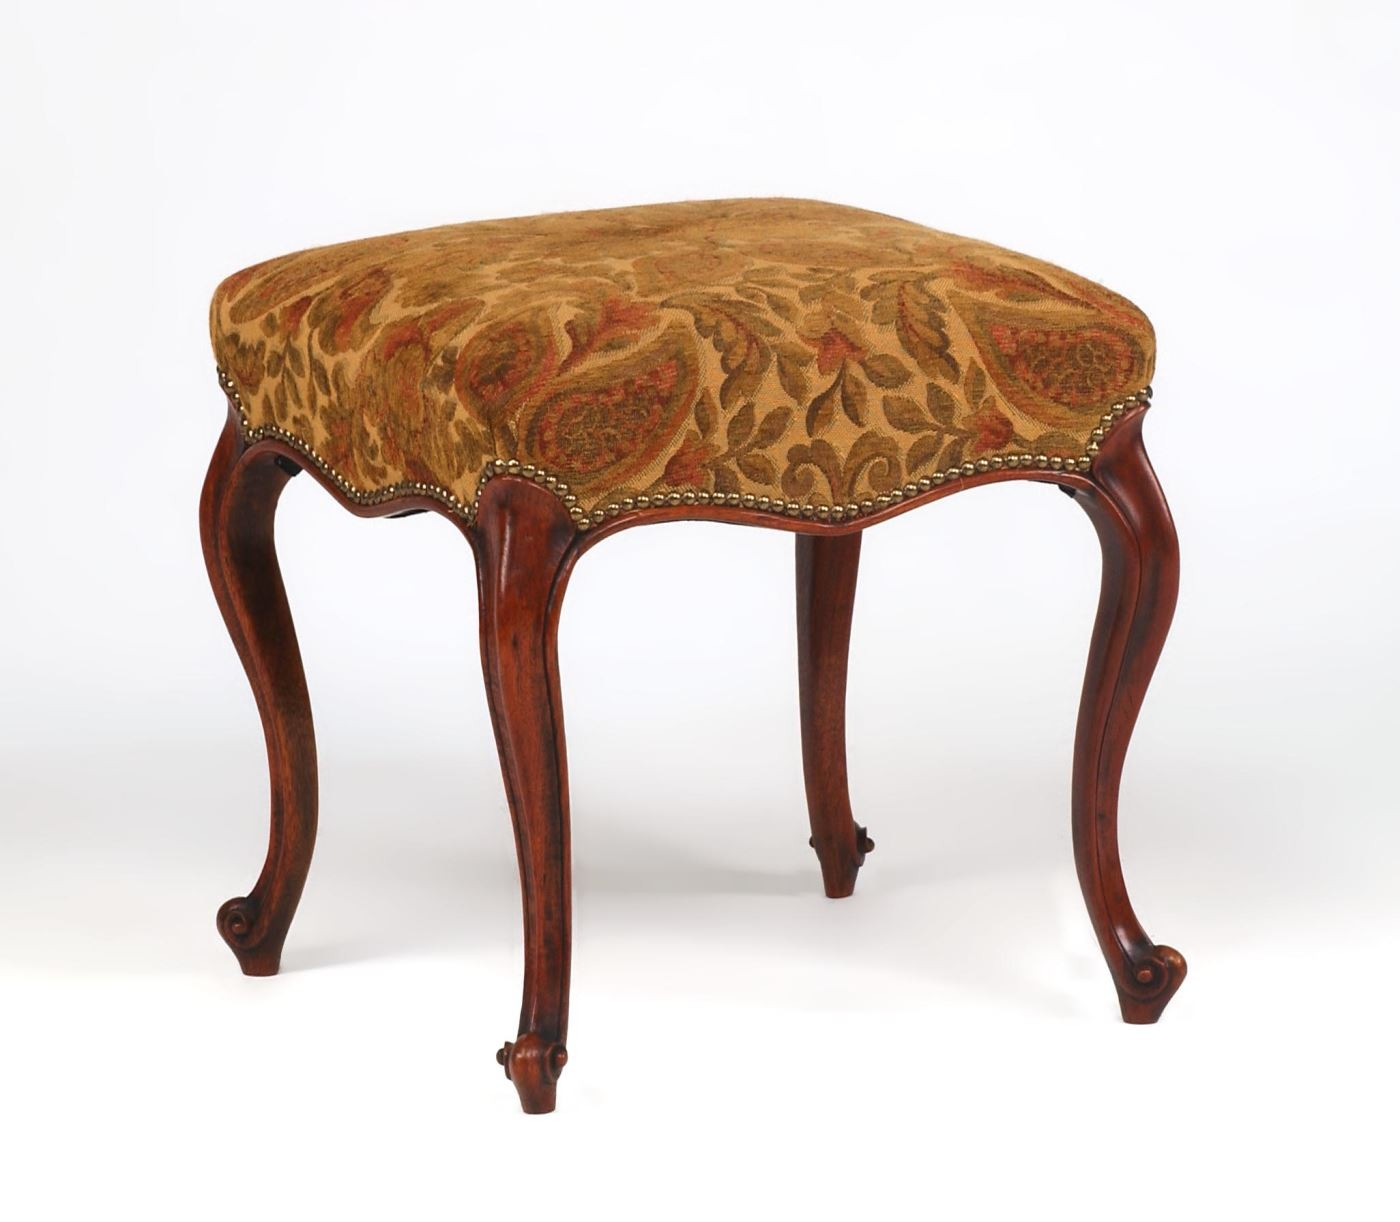 Ormiston stool